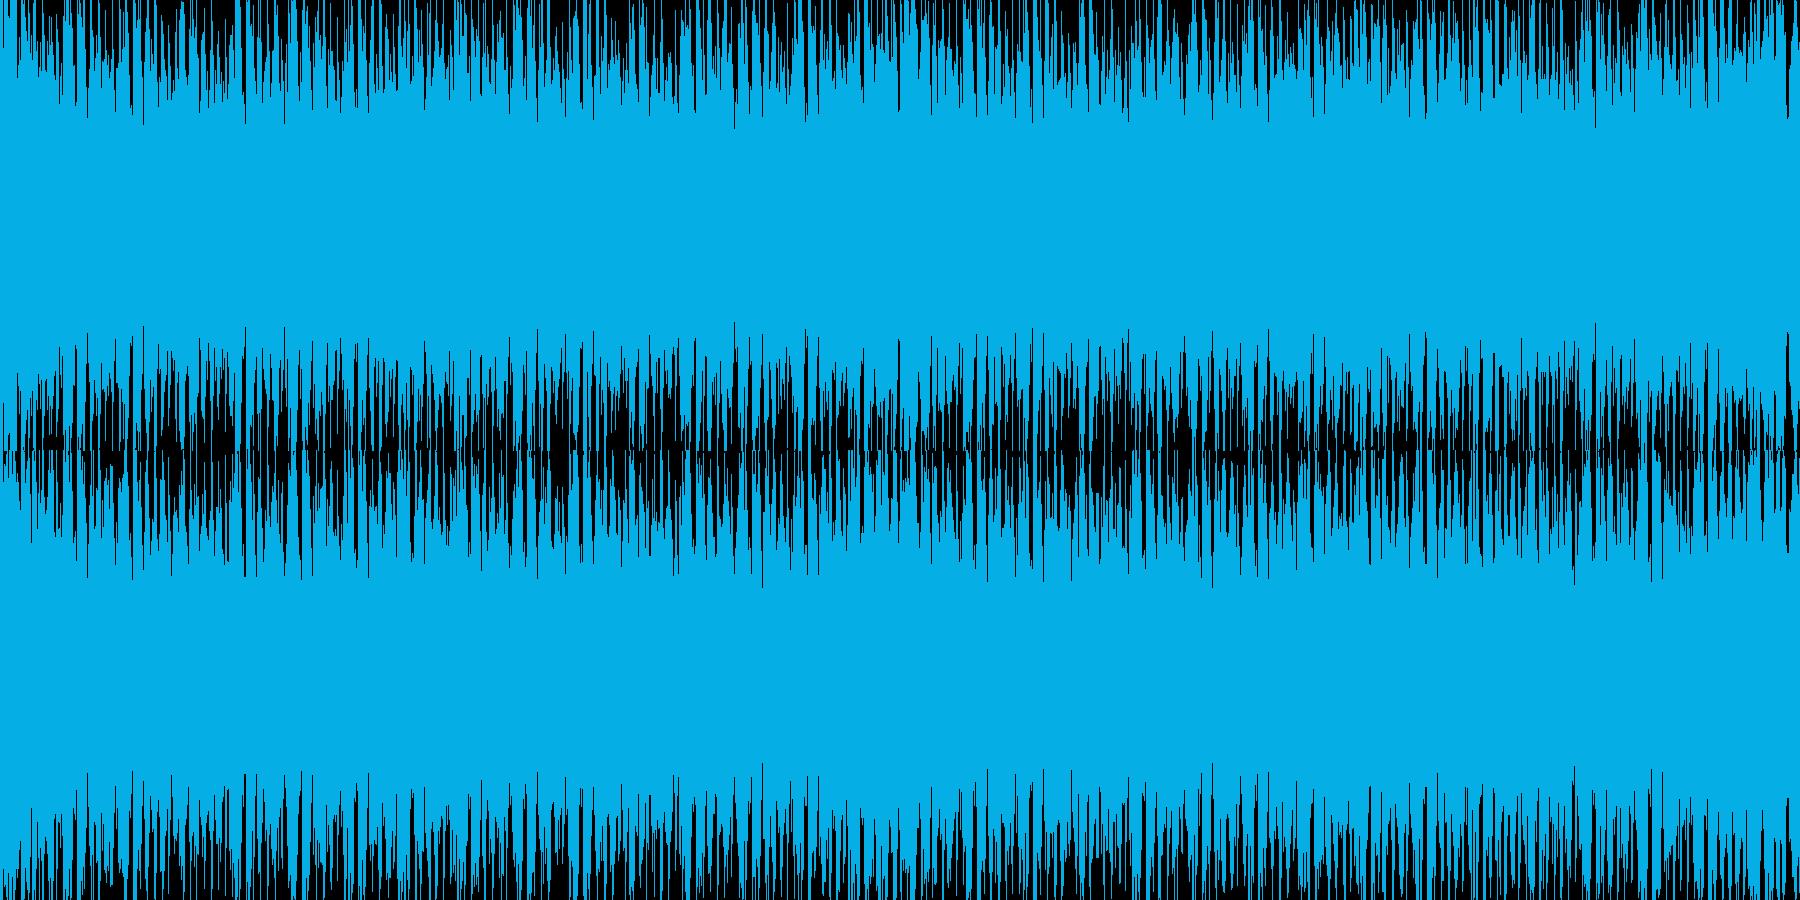 【EDMループ素材】企業・映像制作向きGの再生済みの波形